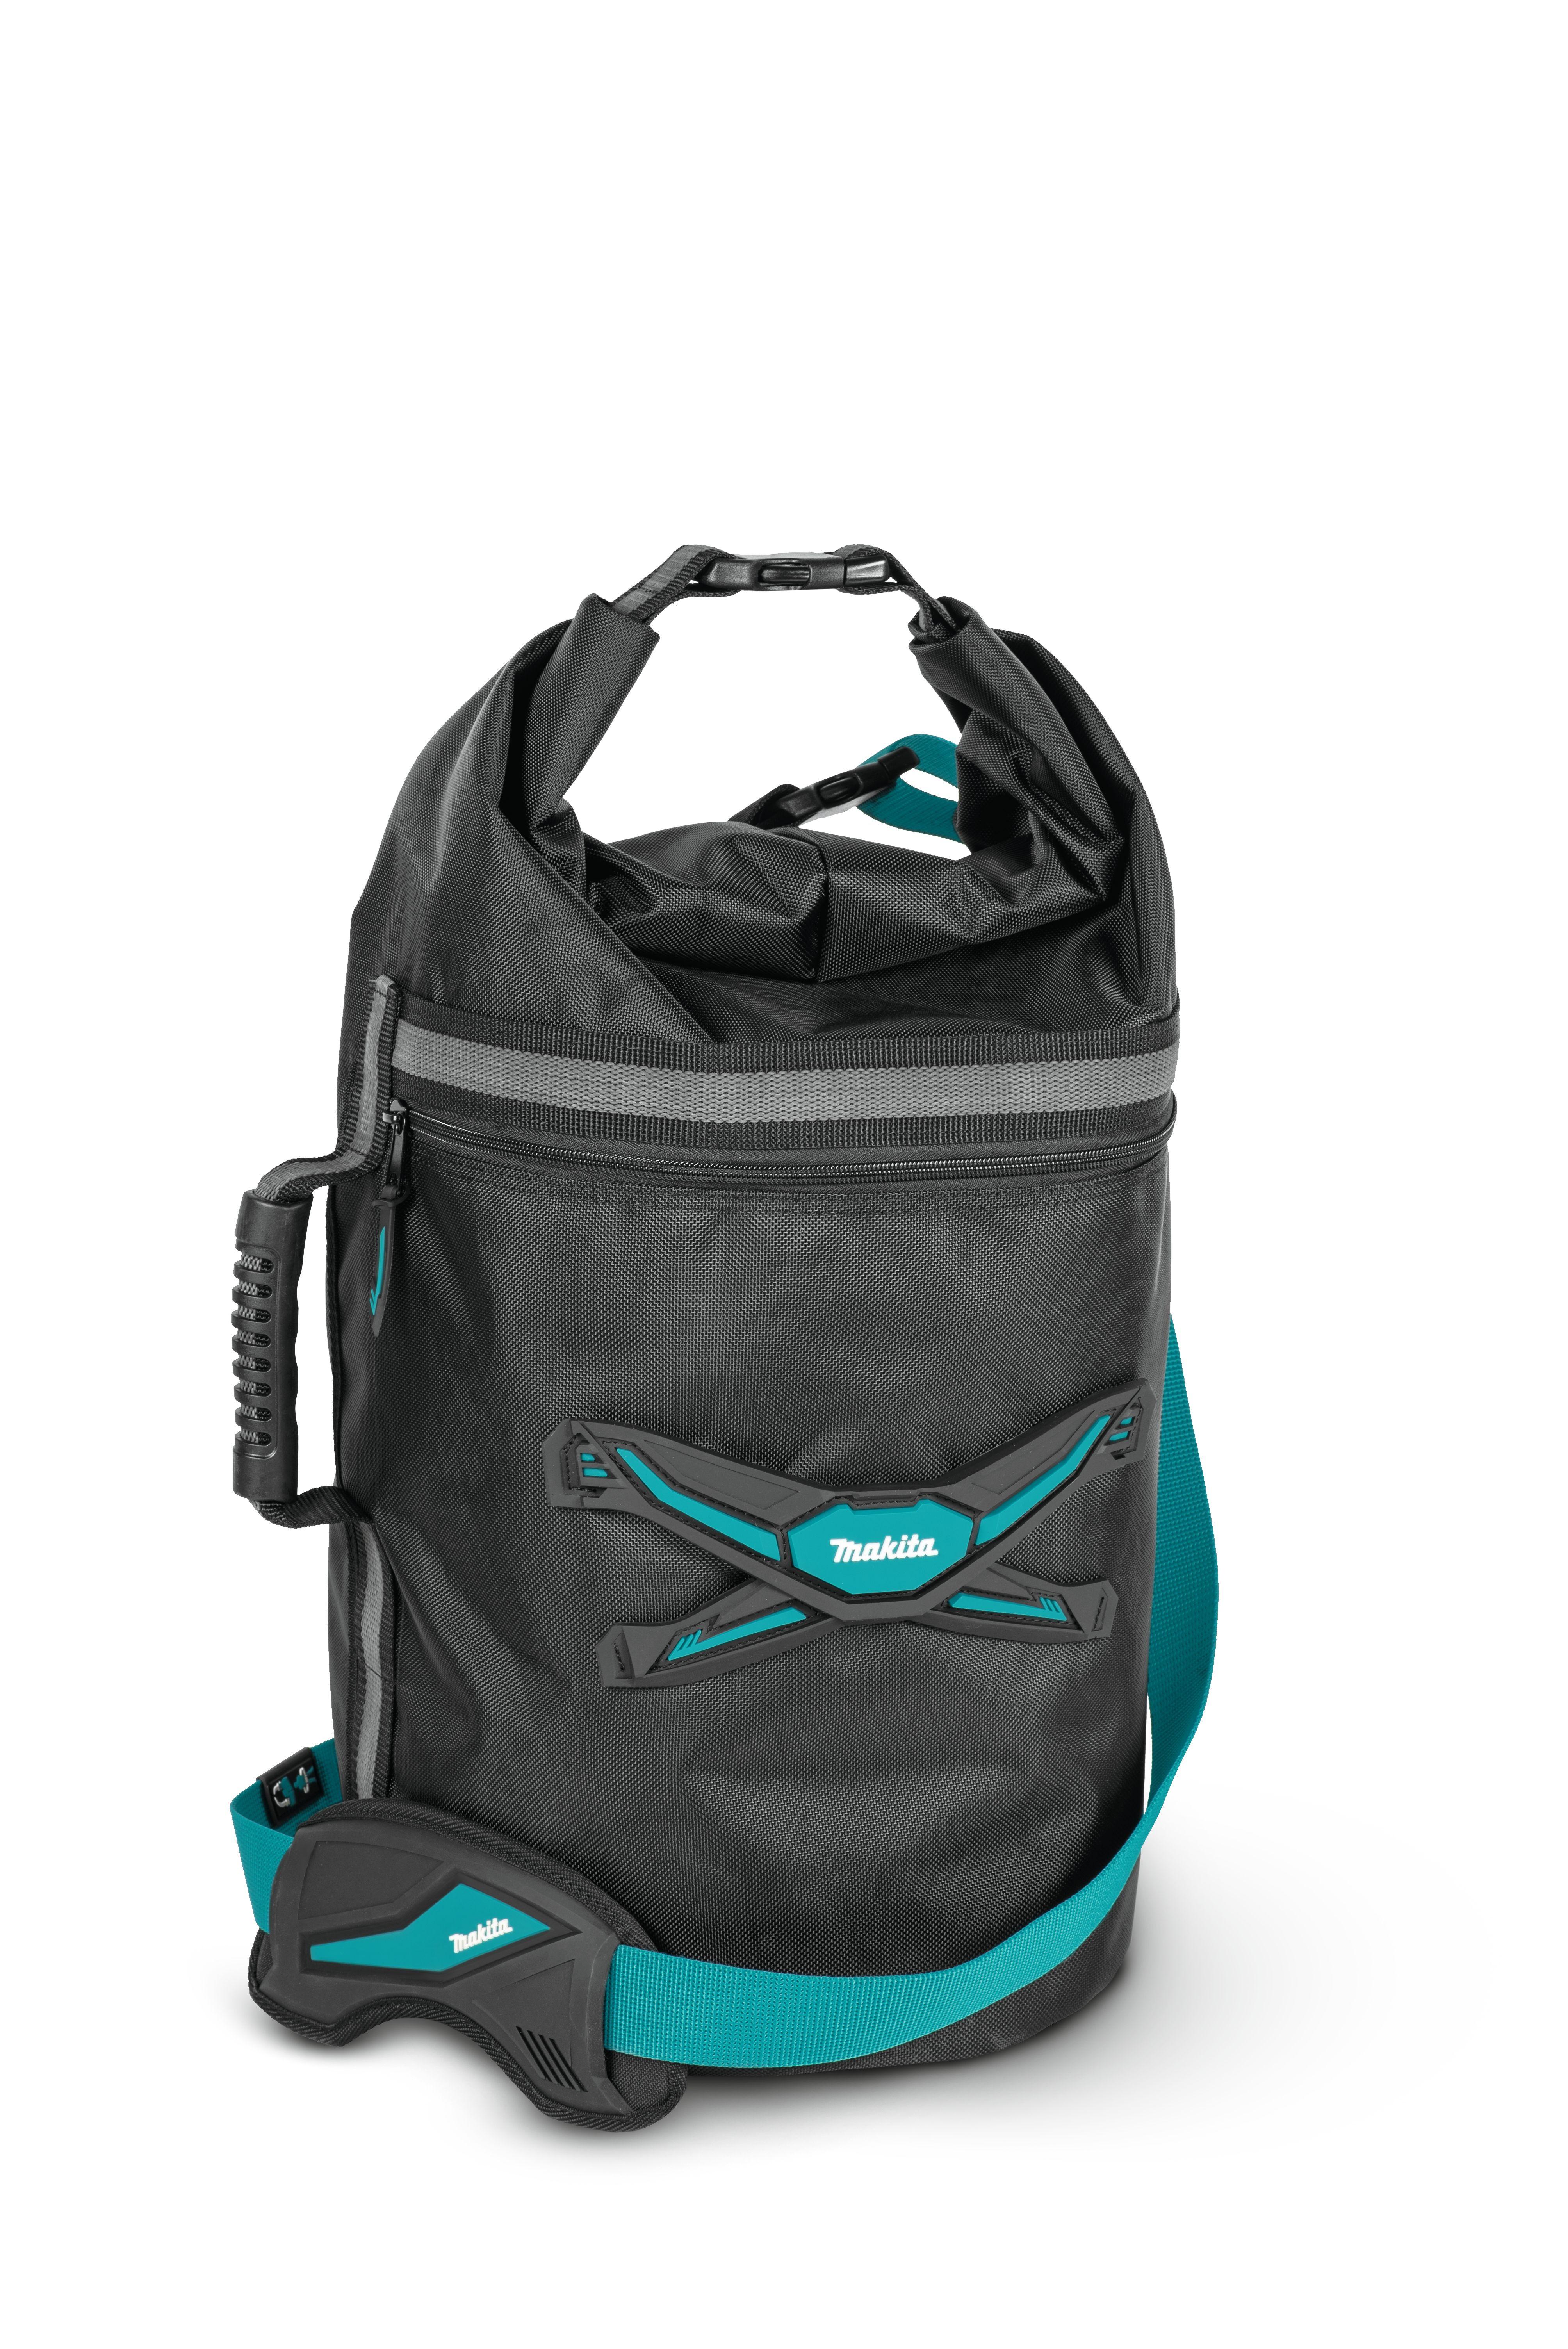 Makita E-05561 batoh  do  každého  počasí  610x300x250mm